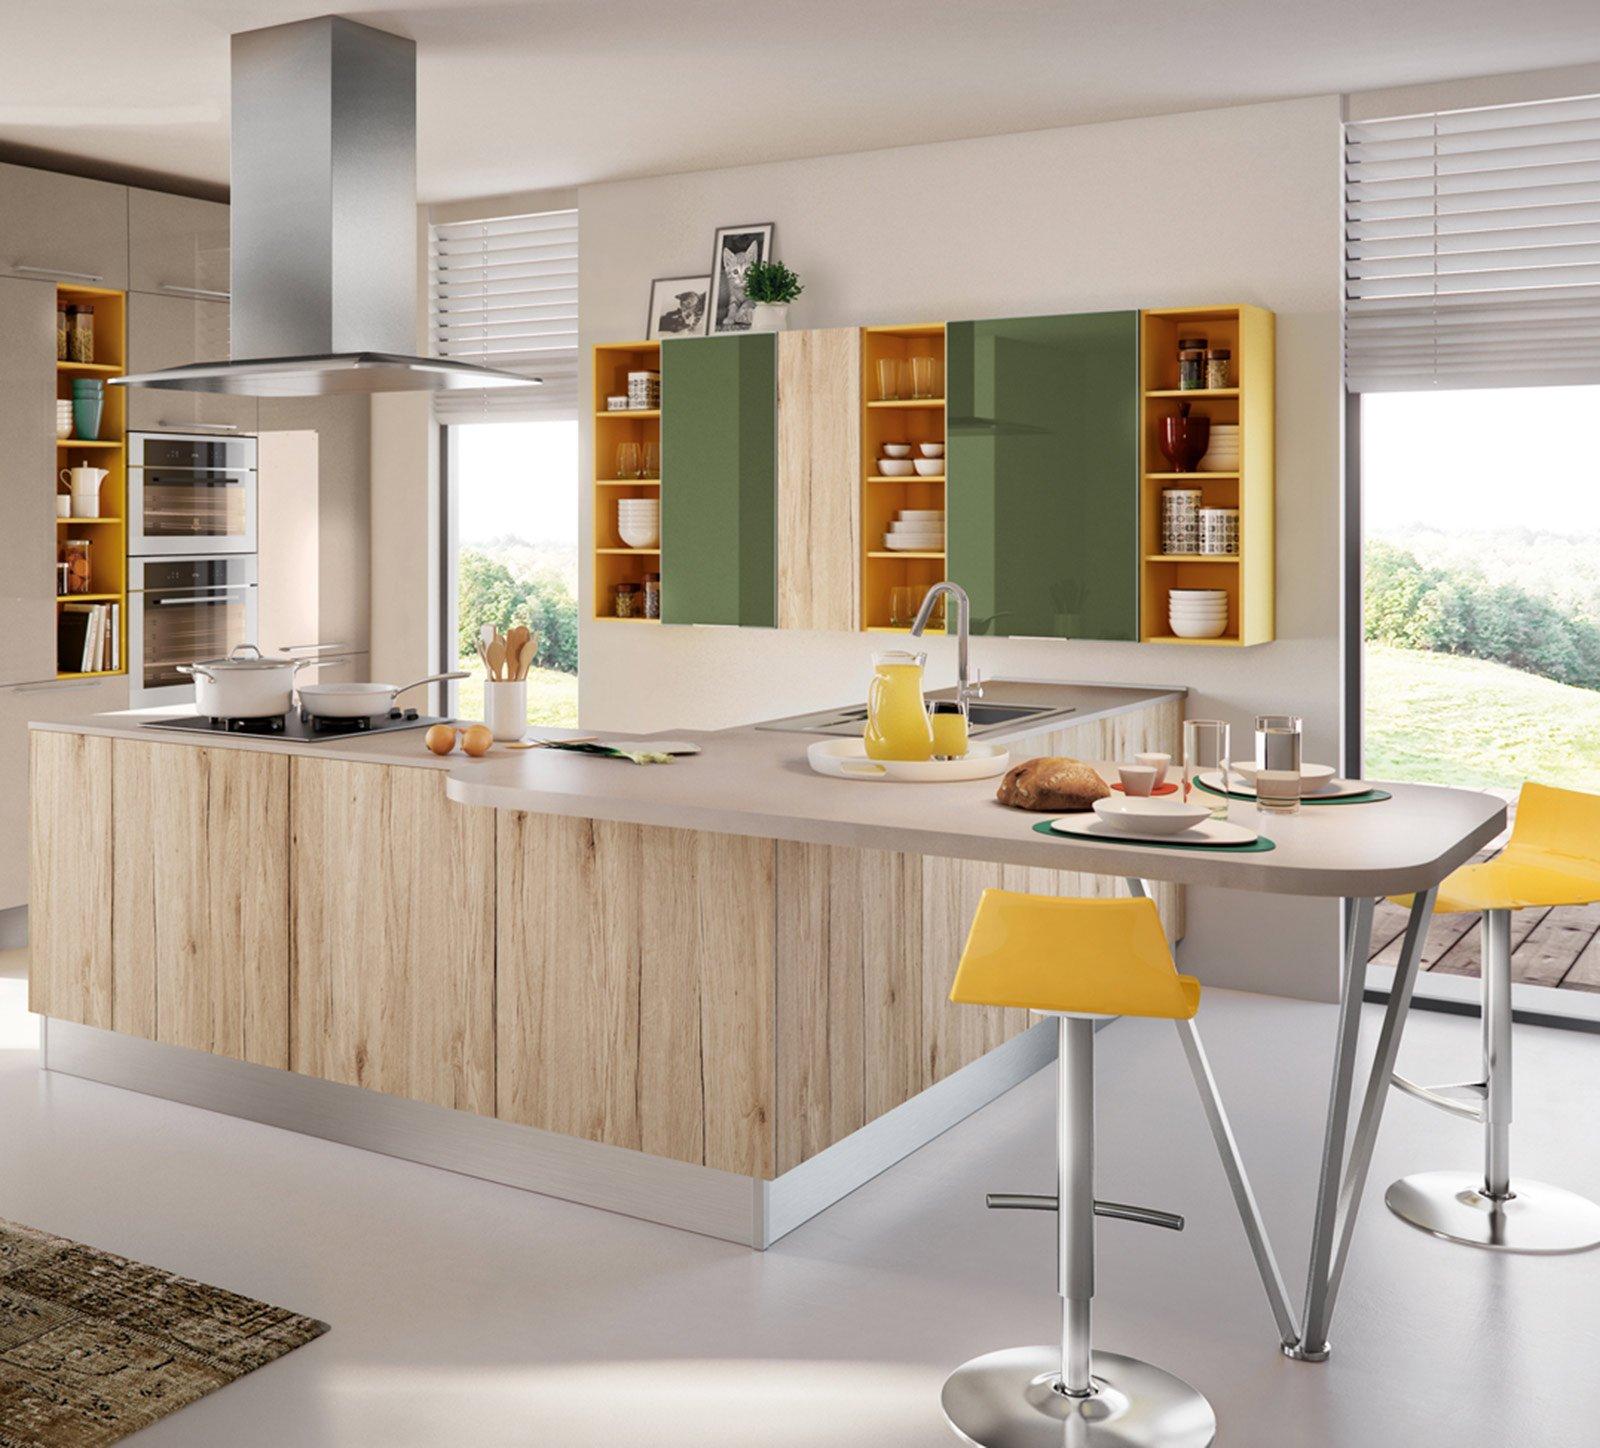 Cucine colori fluo per arredarla cose di casa - Cucine moderne gialle ...